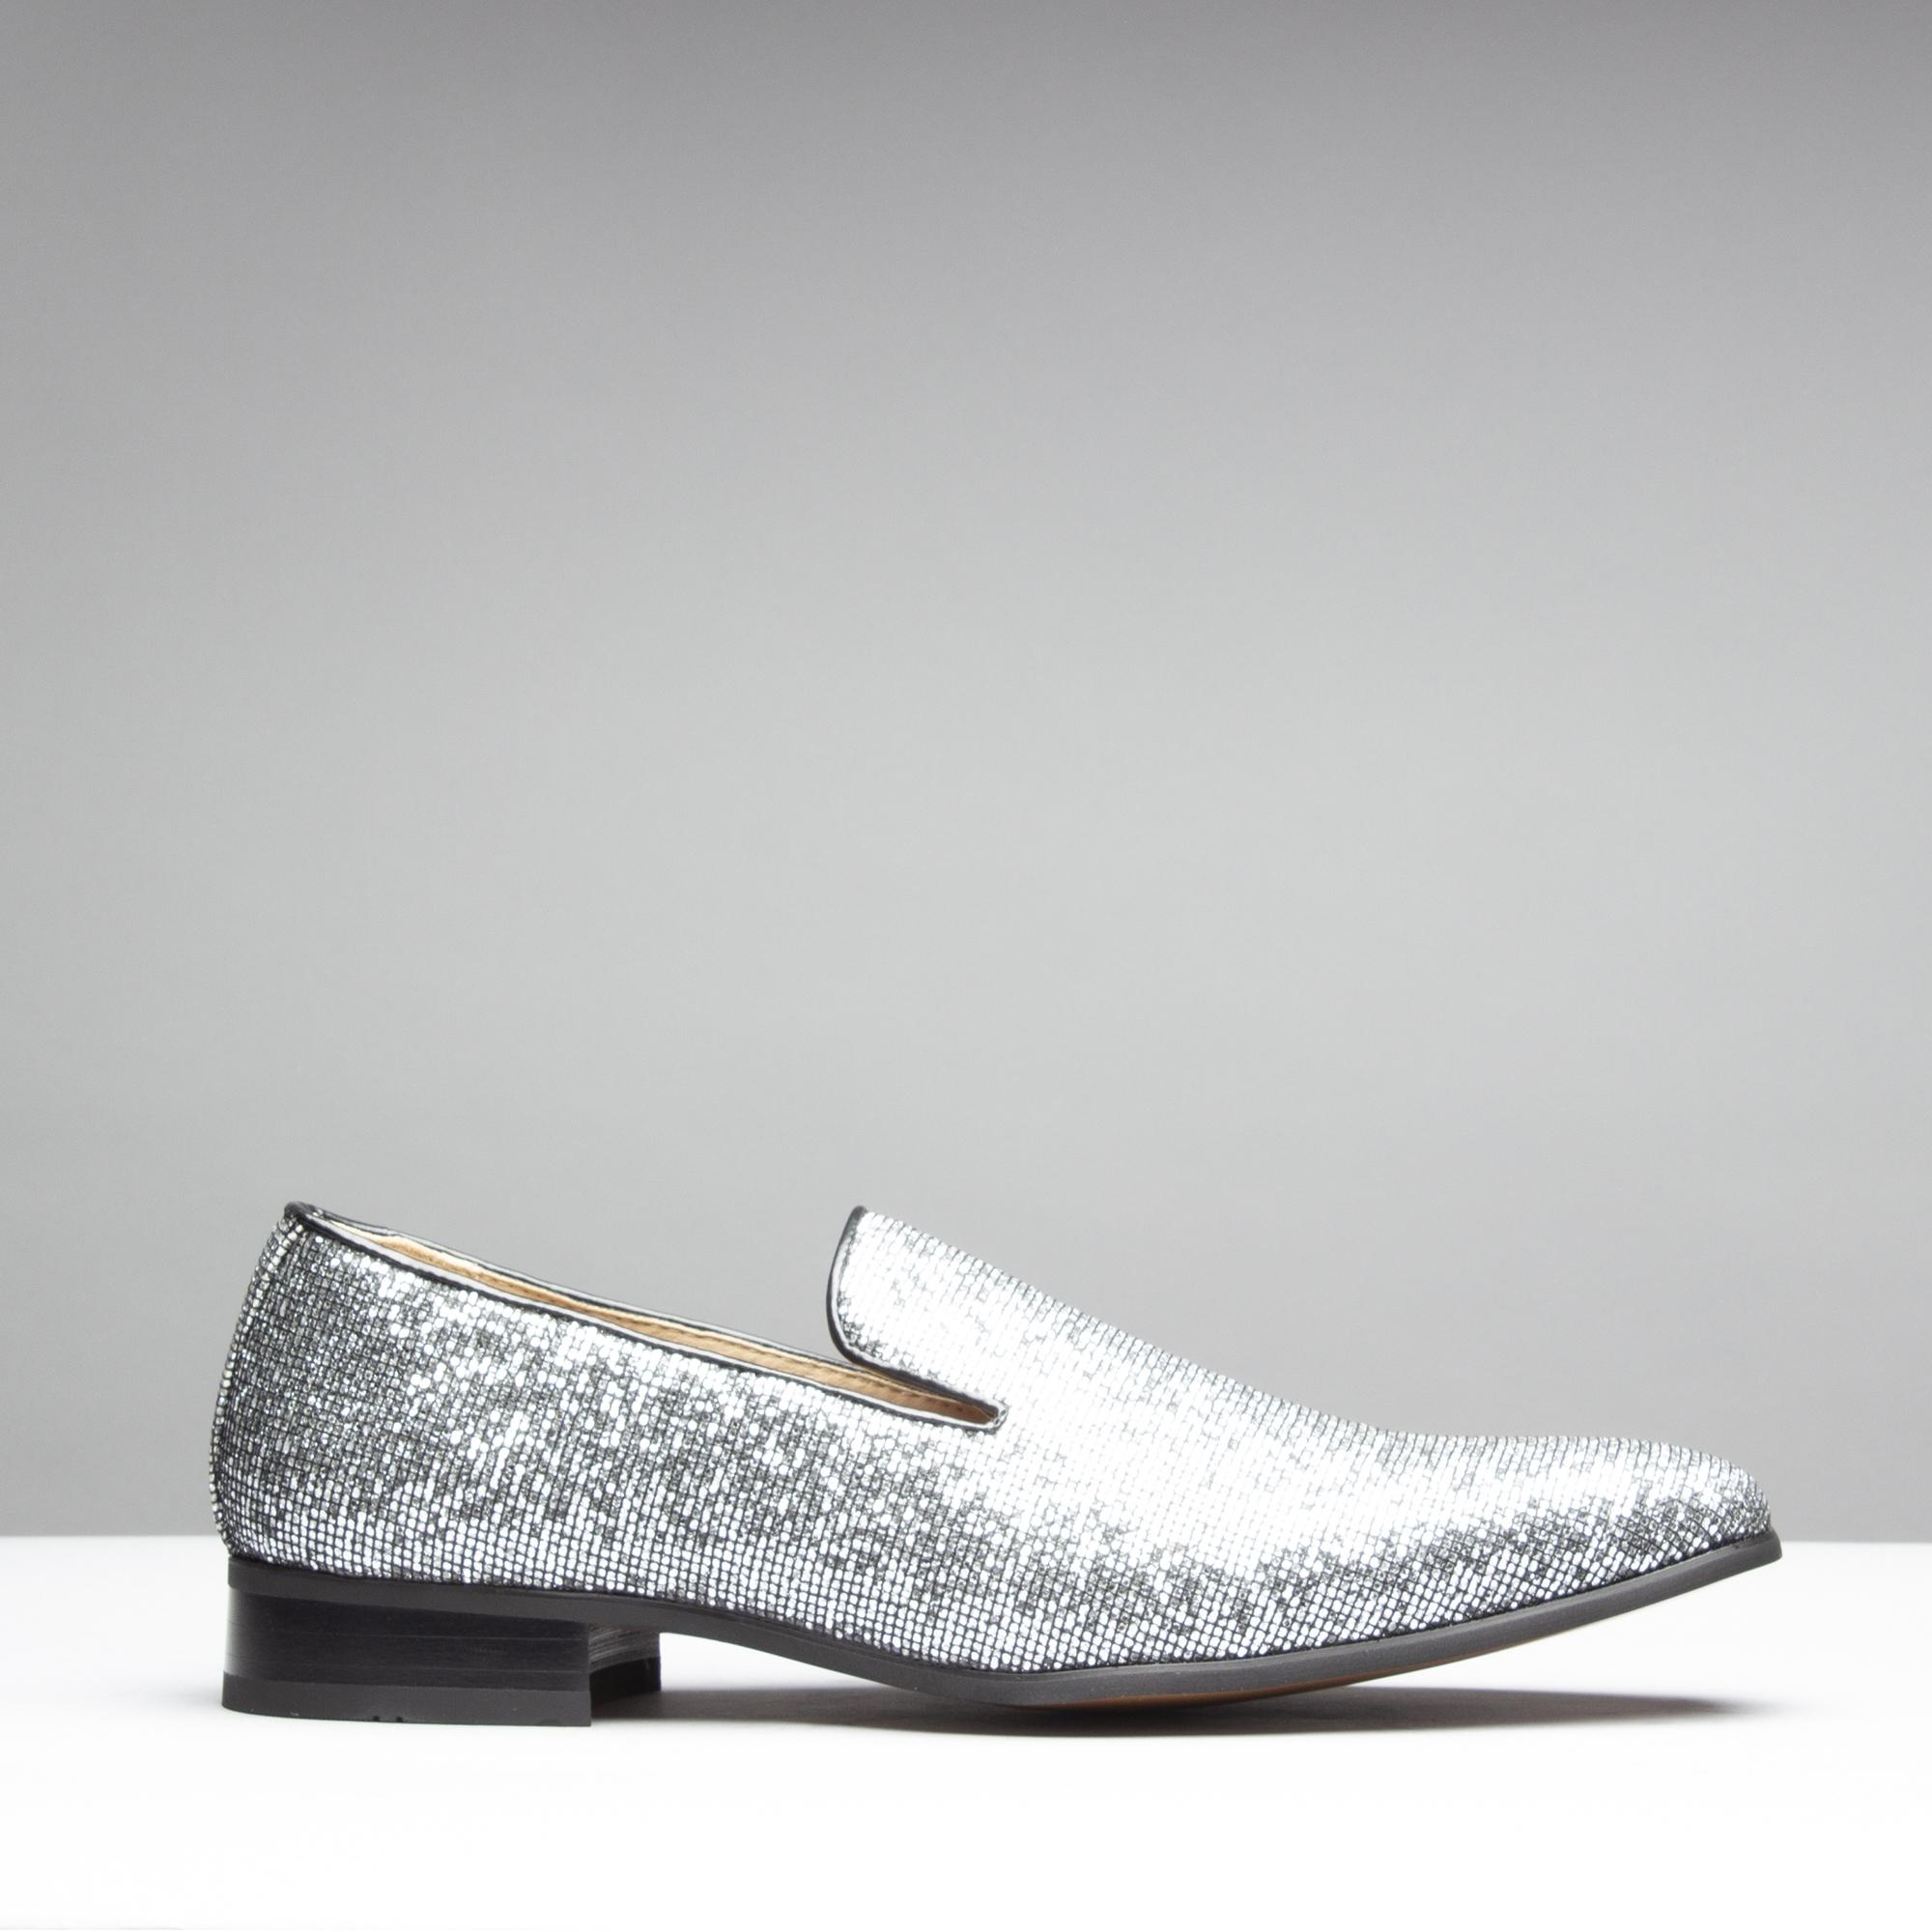 f658f7e6241 Mister Carlo JACKSON Mens Sparkling Loafers Black Silver